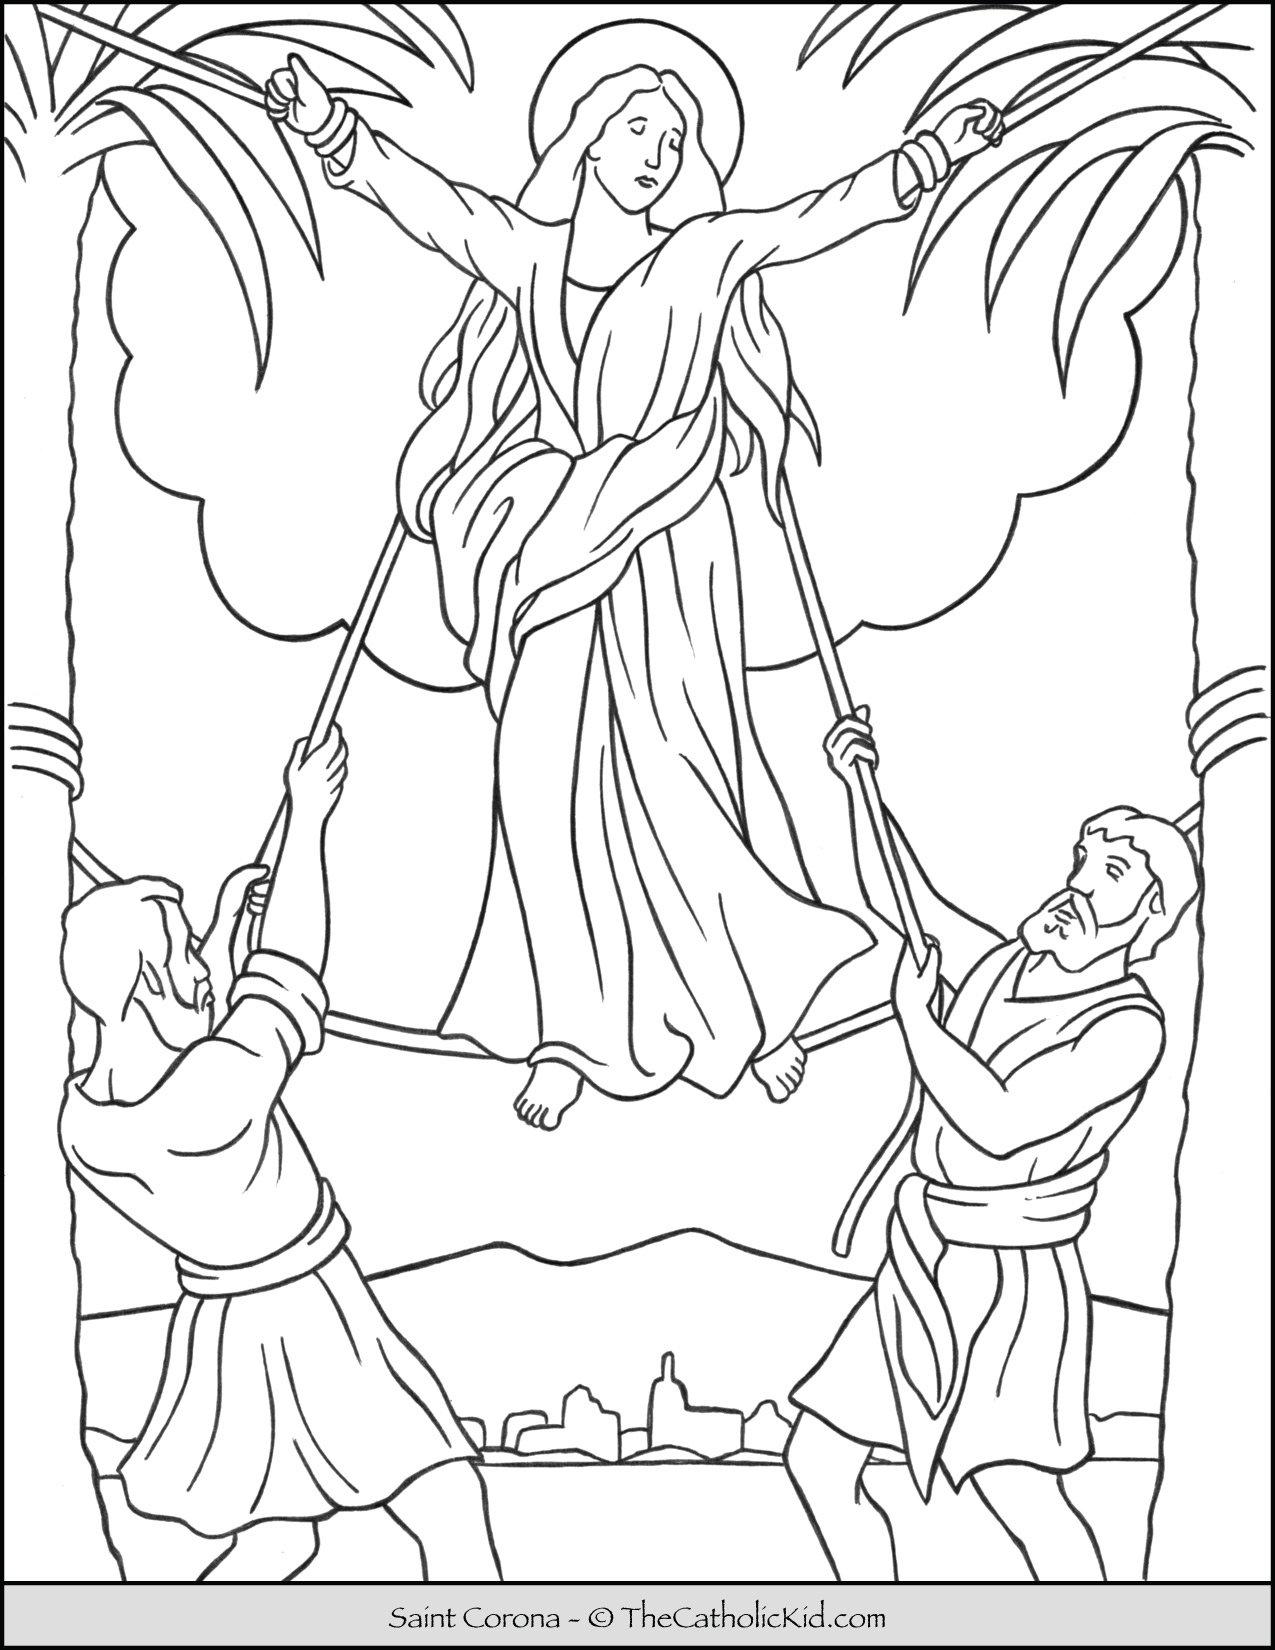 Saint Corona Coloring Page